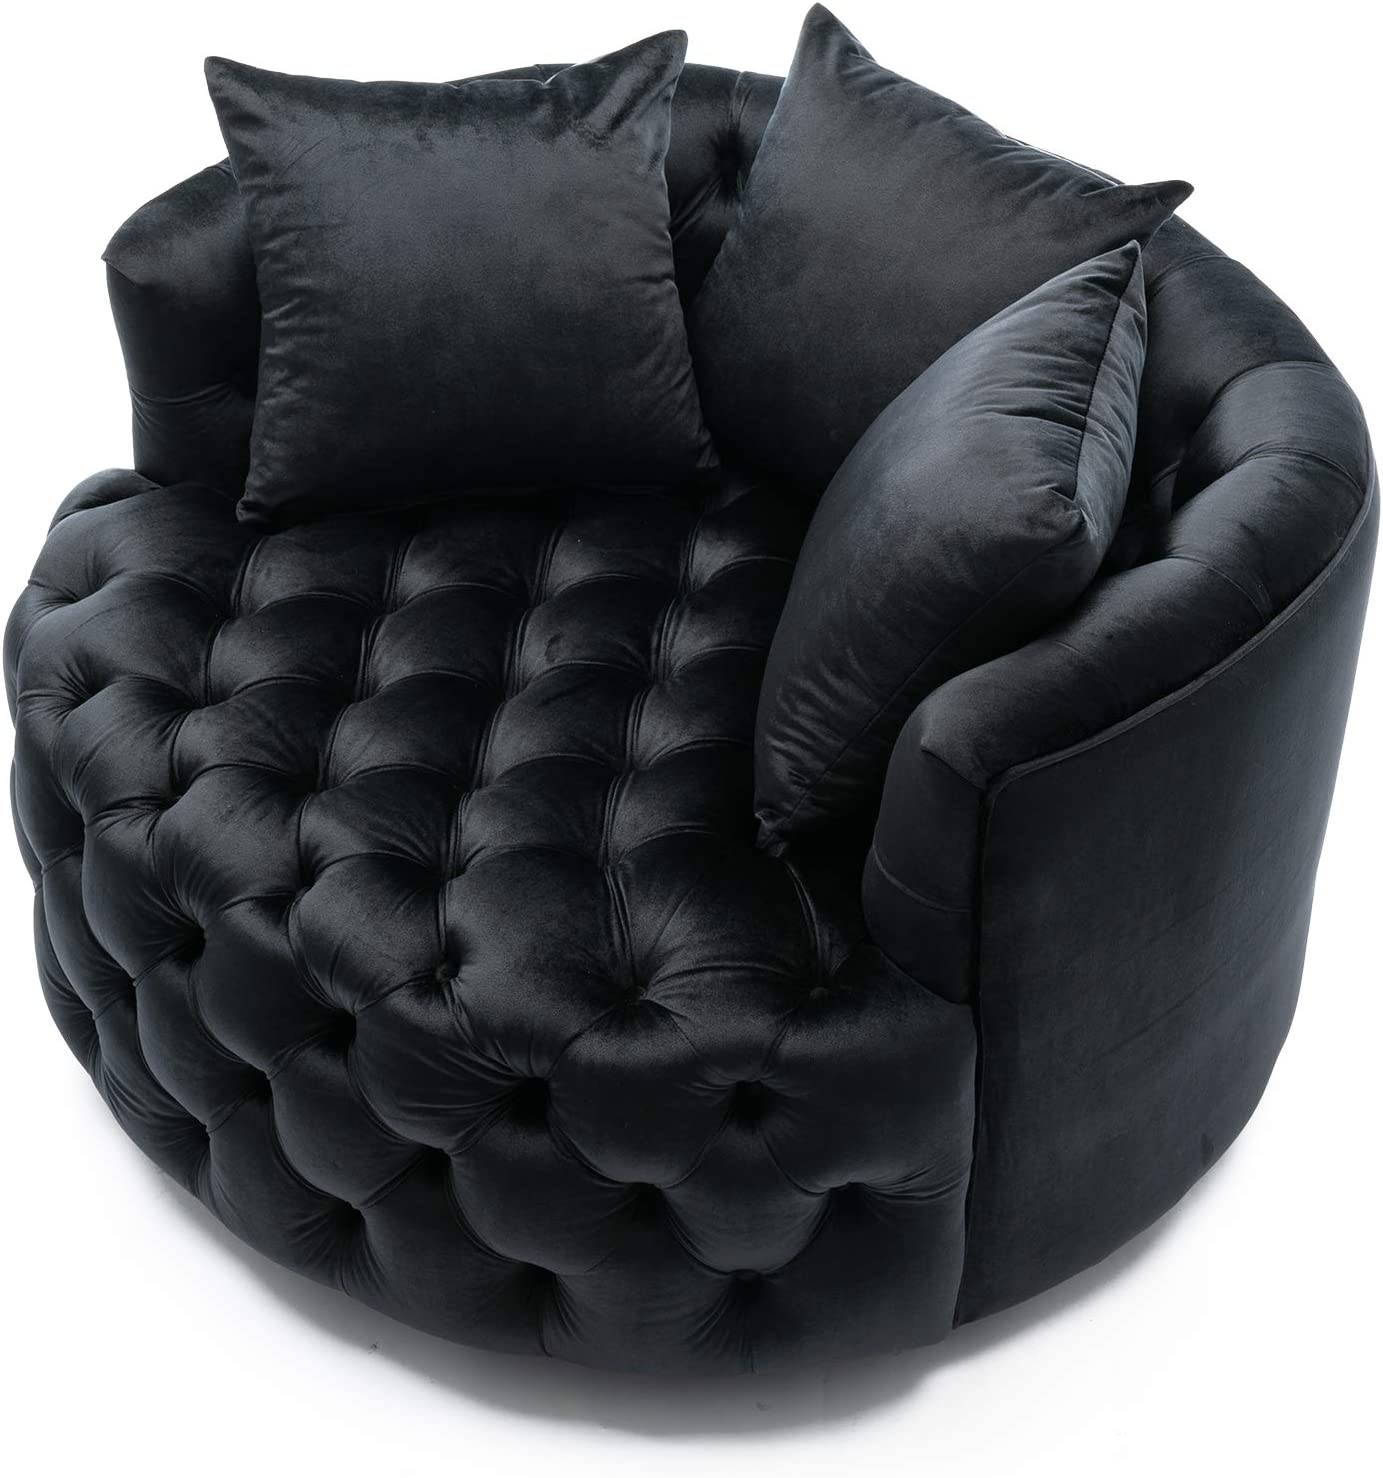 Modern Velvet Swivel Accent Chair Barrel Chair for Home Living Room/Modern Leisure Chair (43.70 Inches, Black)